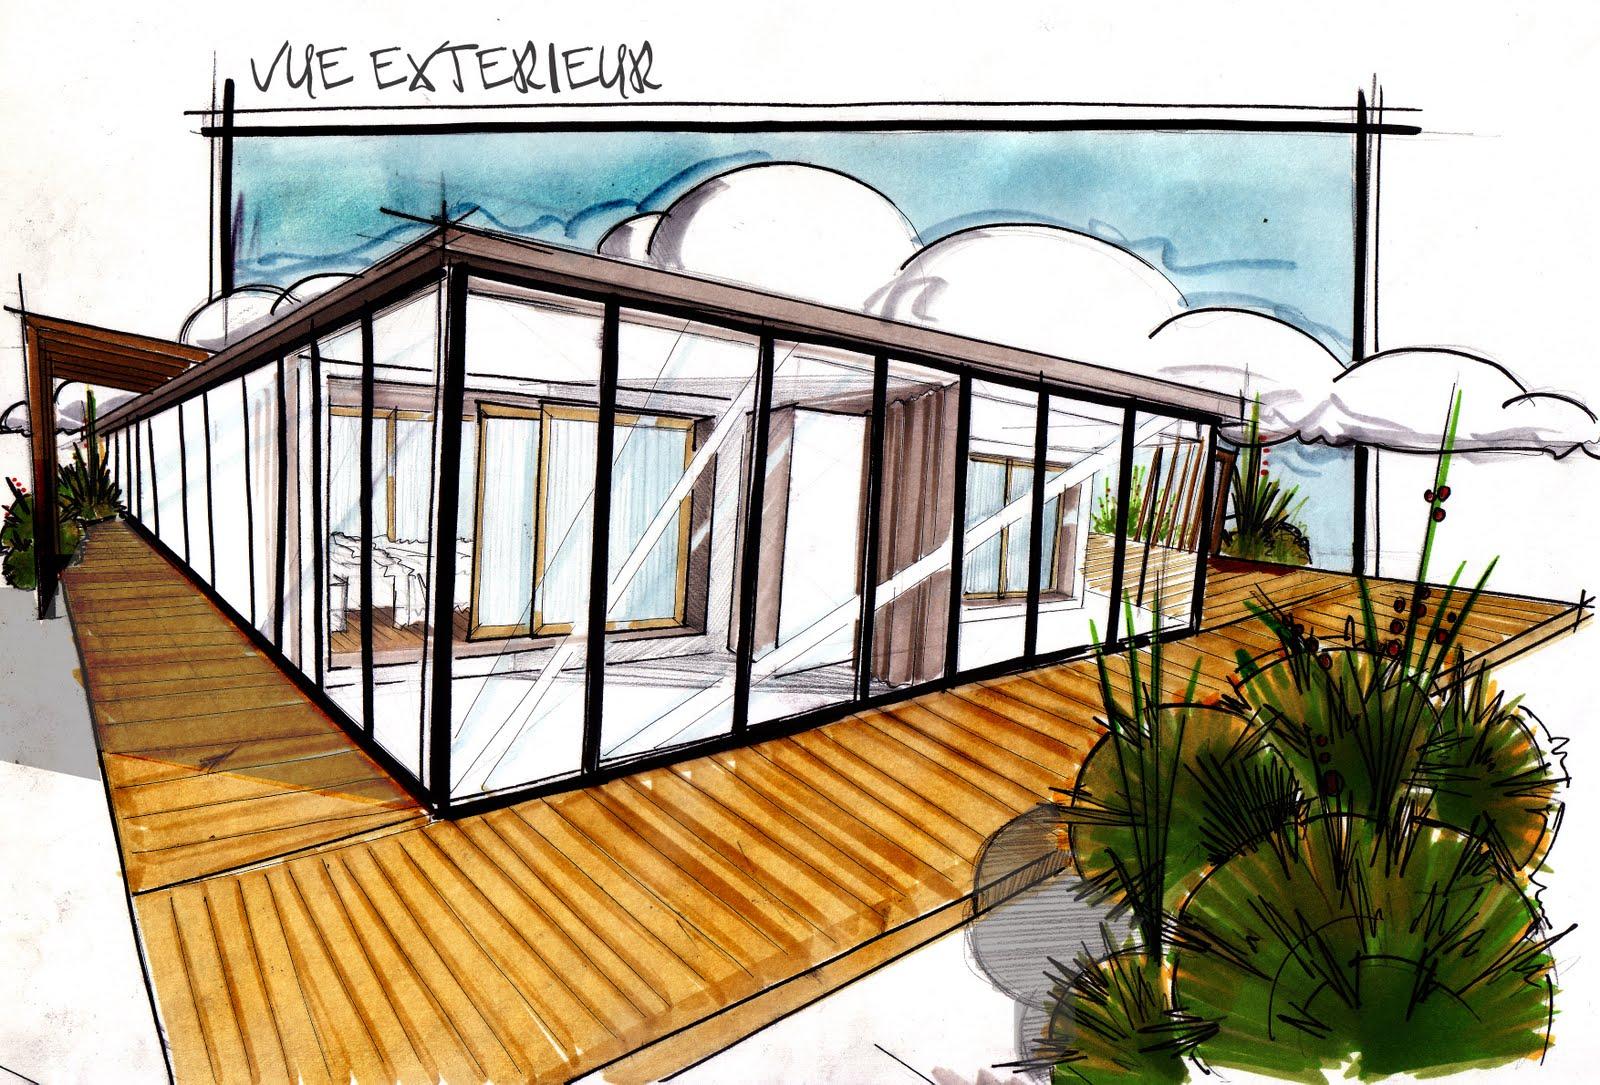 Design et architecture interieure architecture for Architecture et design